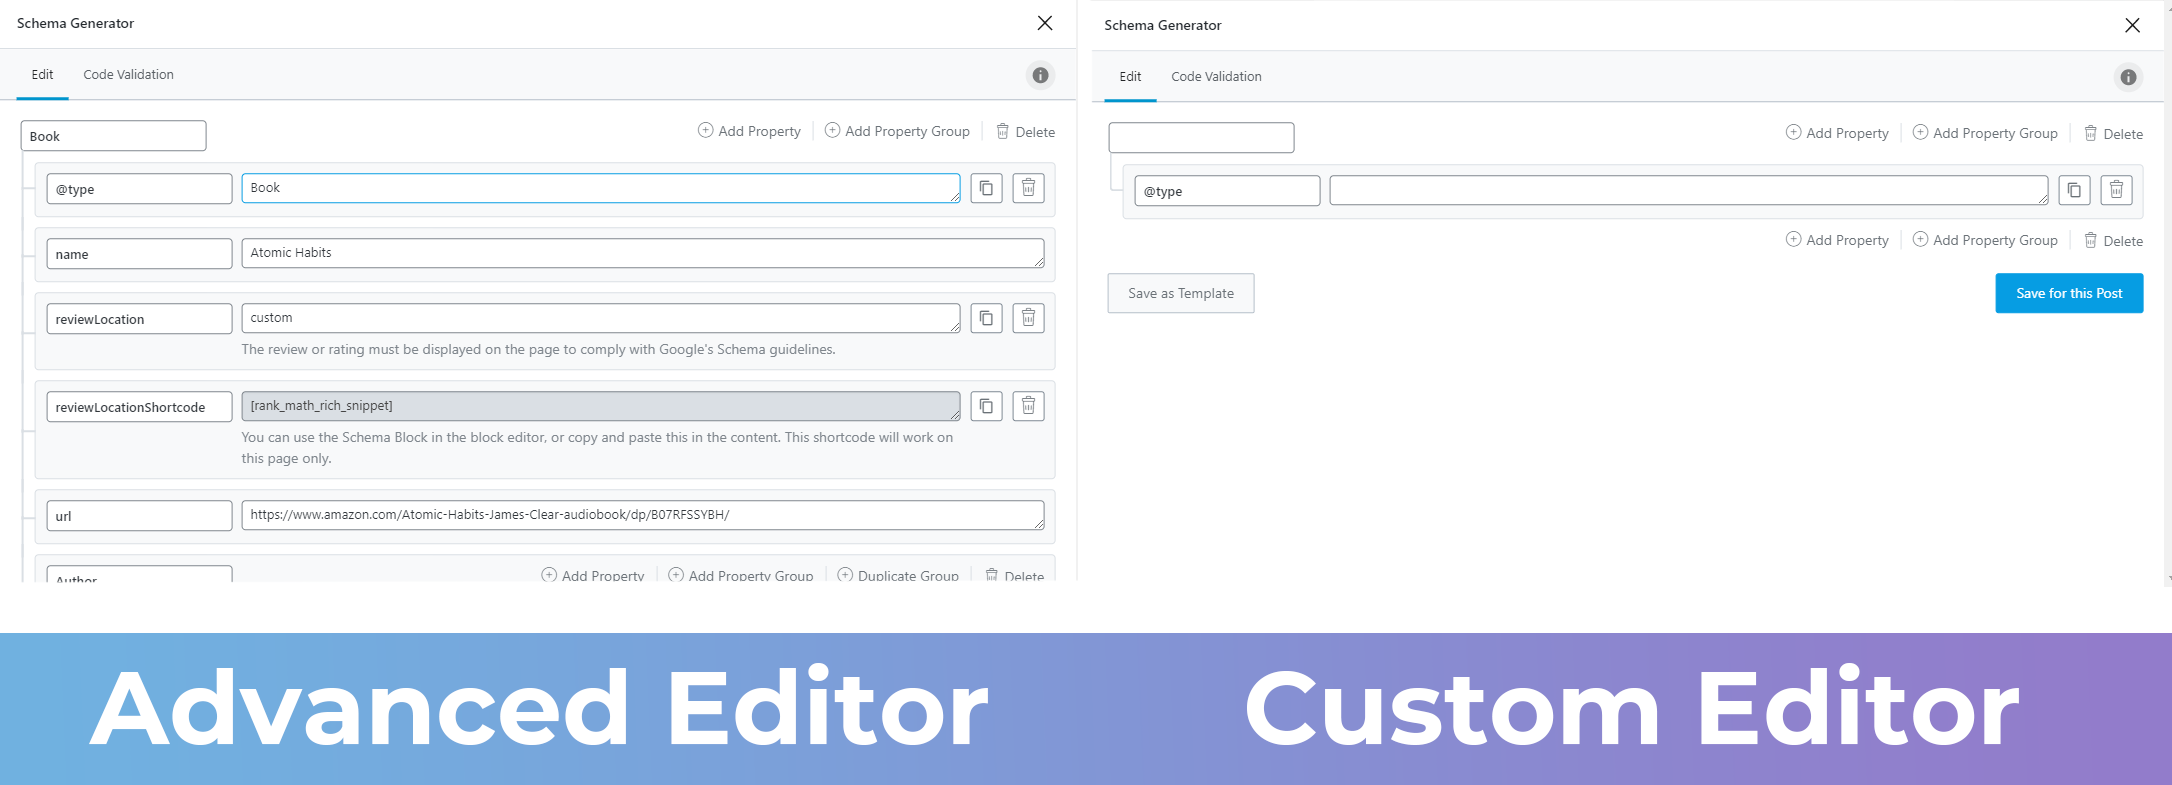 Similarity Between Advanced And Custom Editor